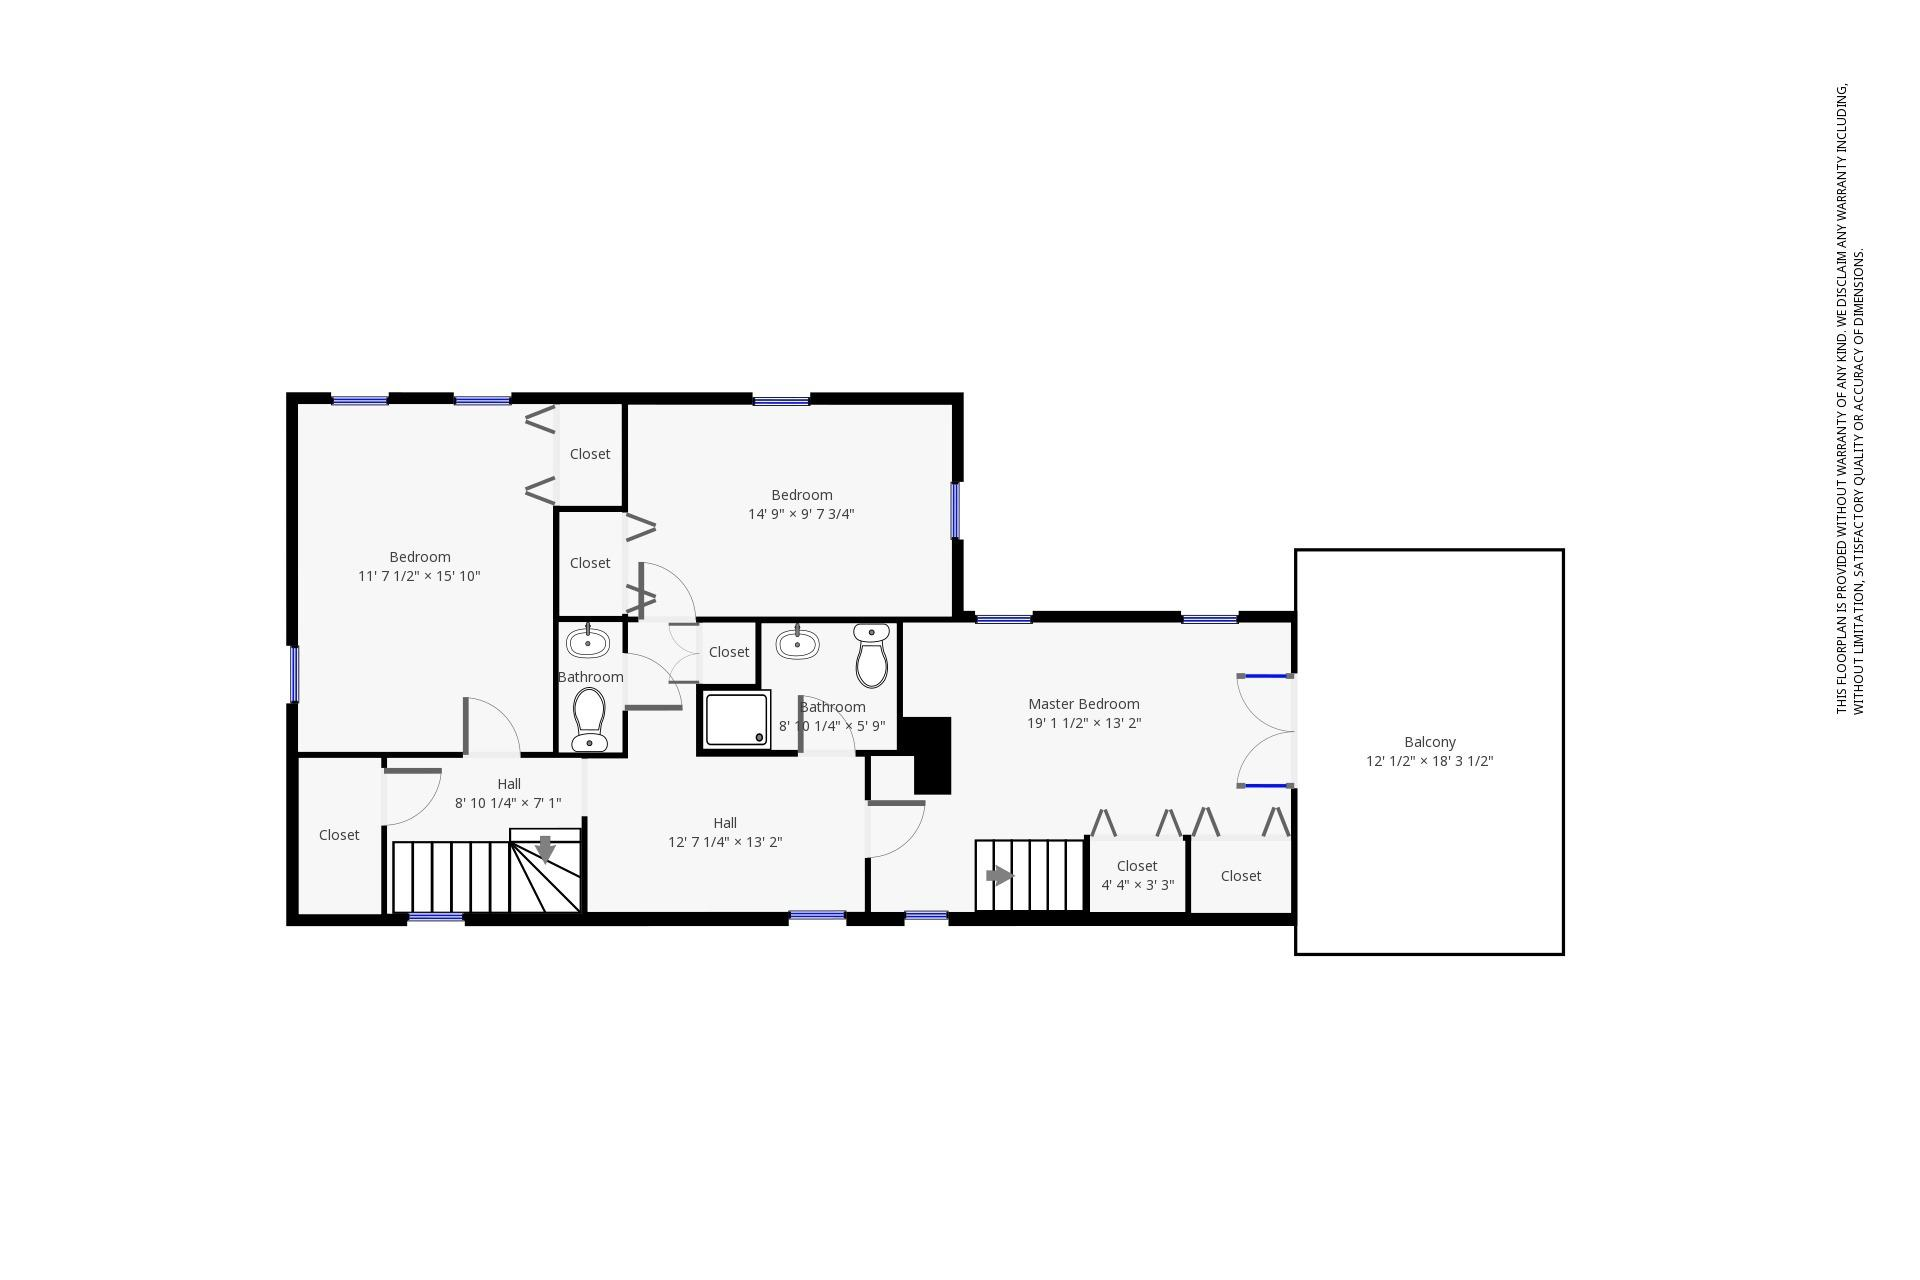 331 main street chatham ma 02633 property image 47